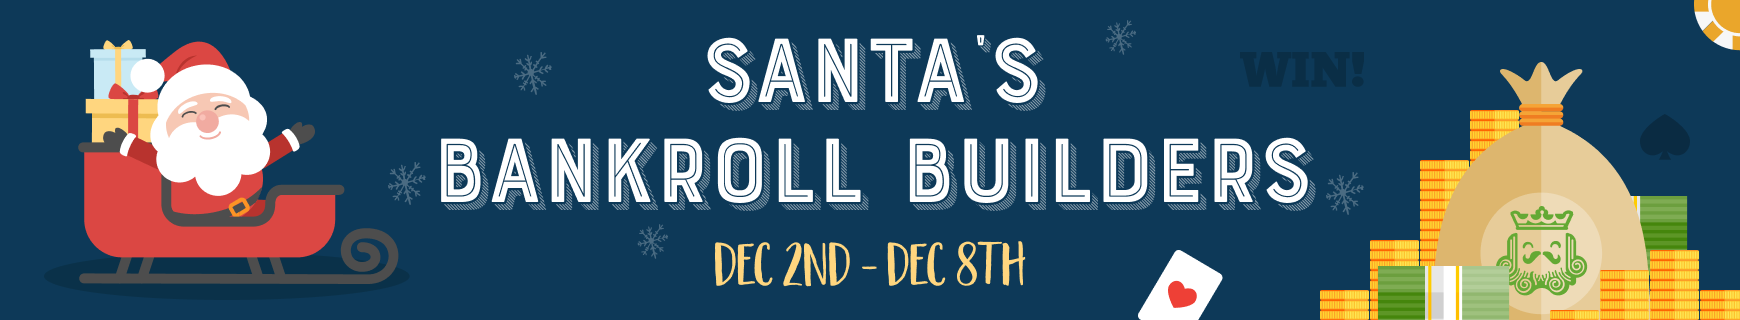 Santa's bankroll builders   dashboard %28870 x 160%29